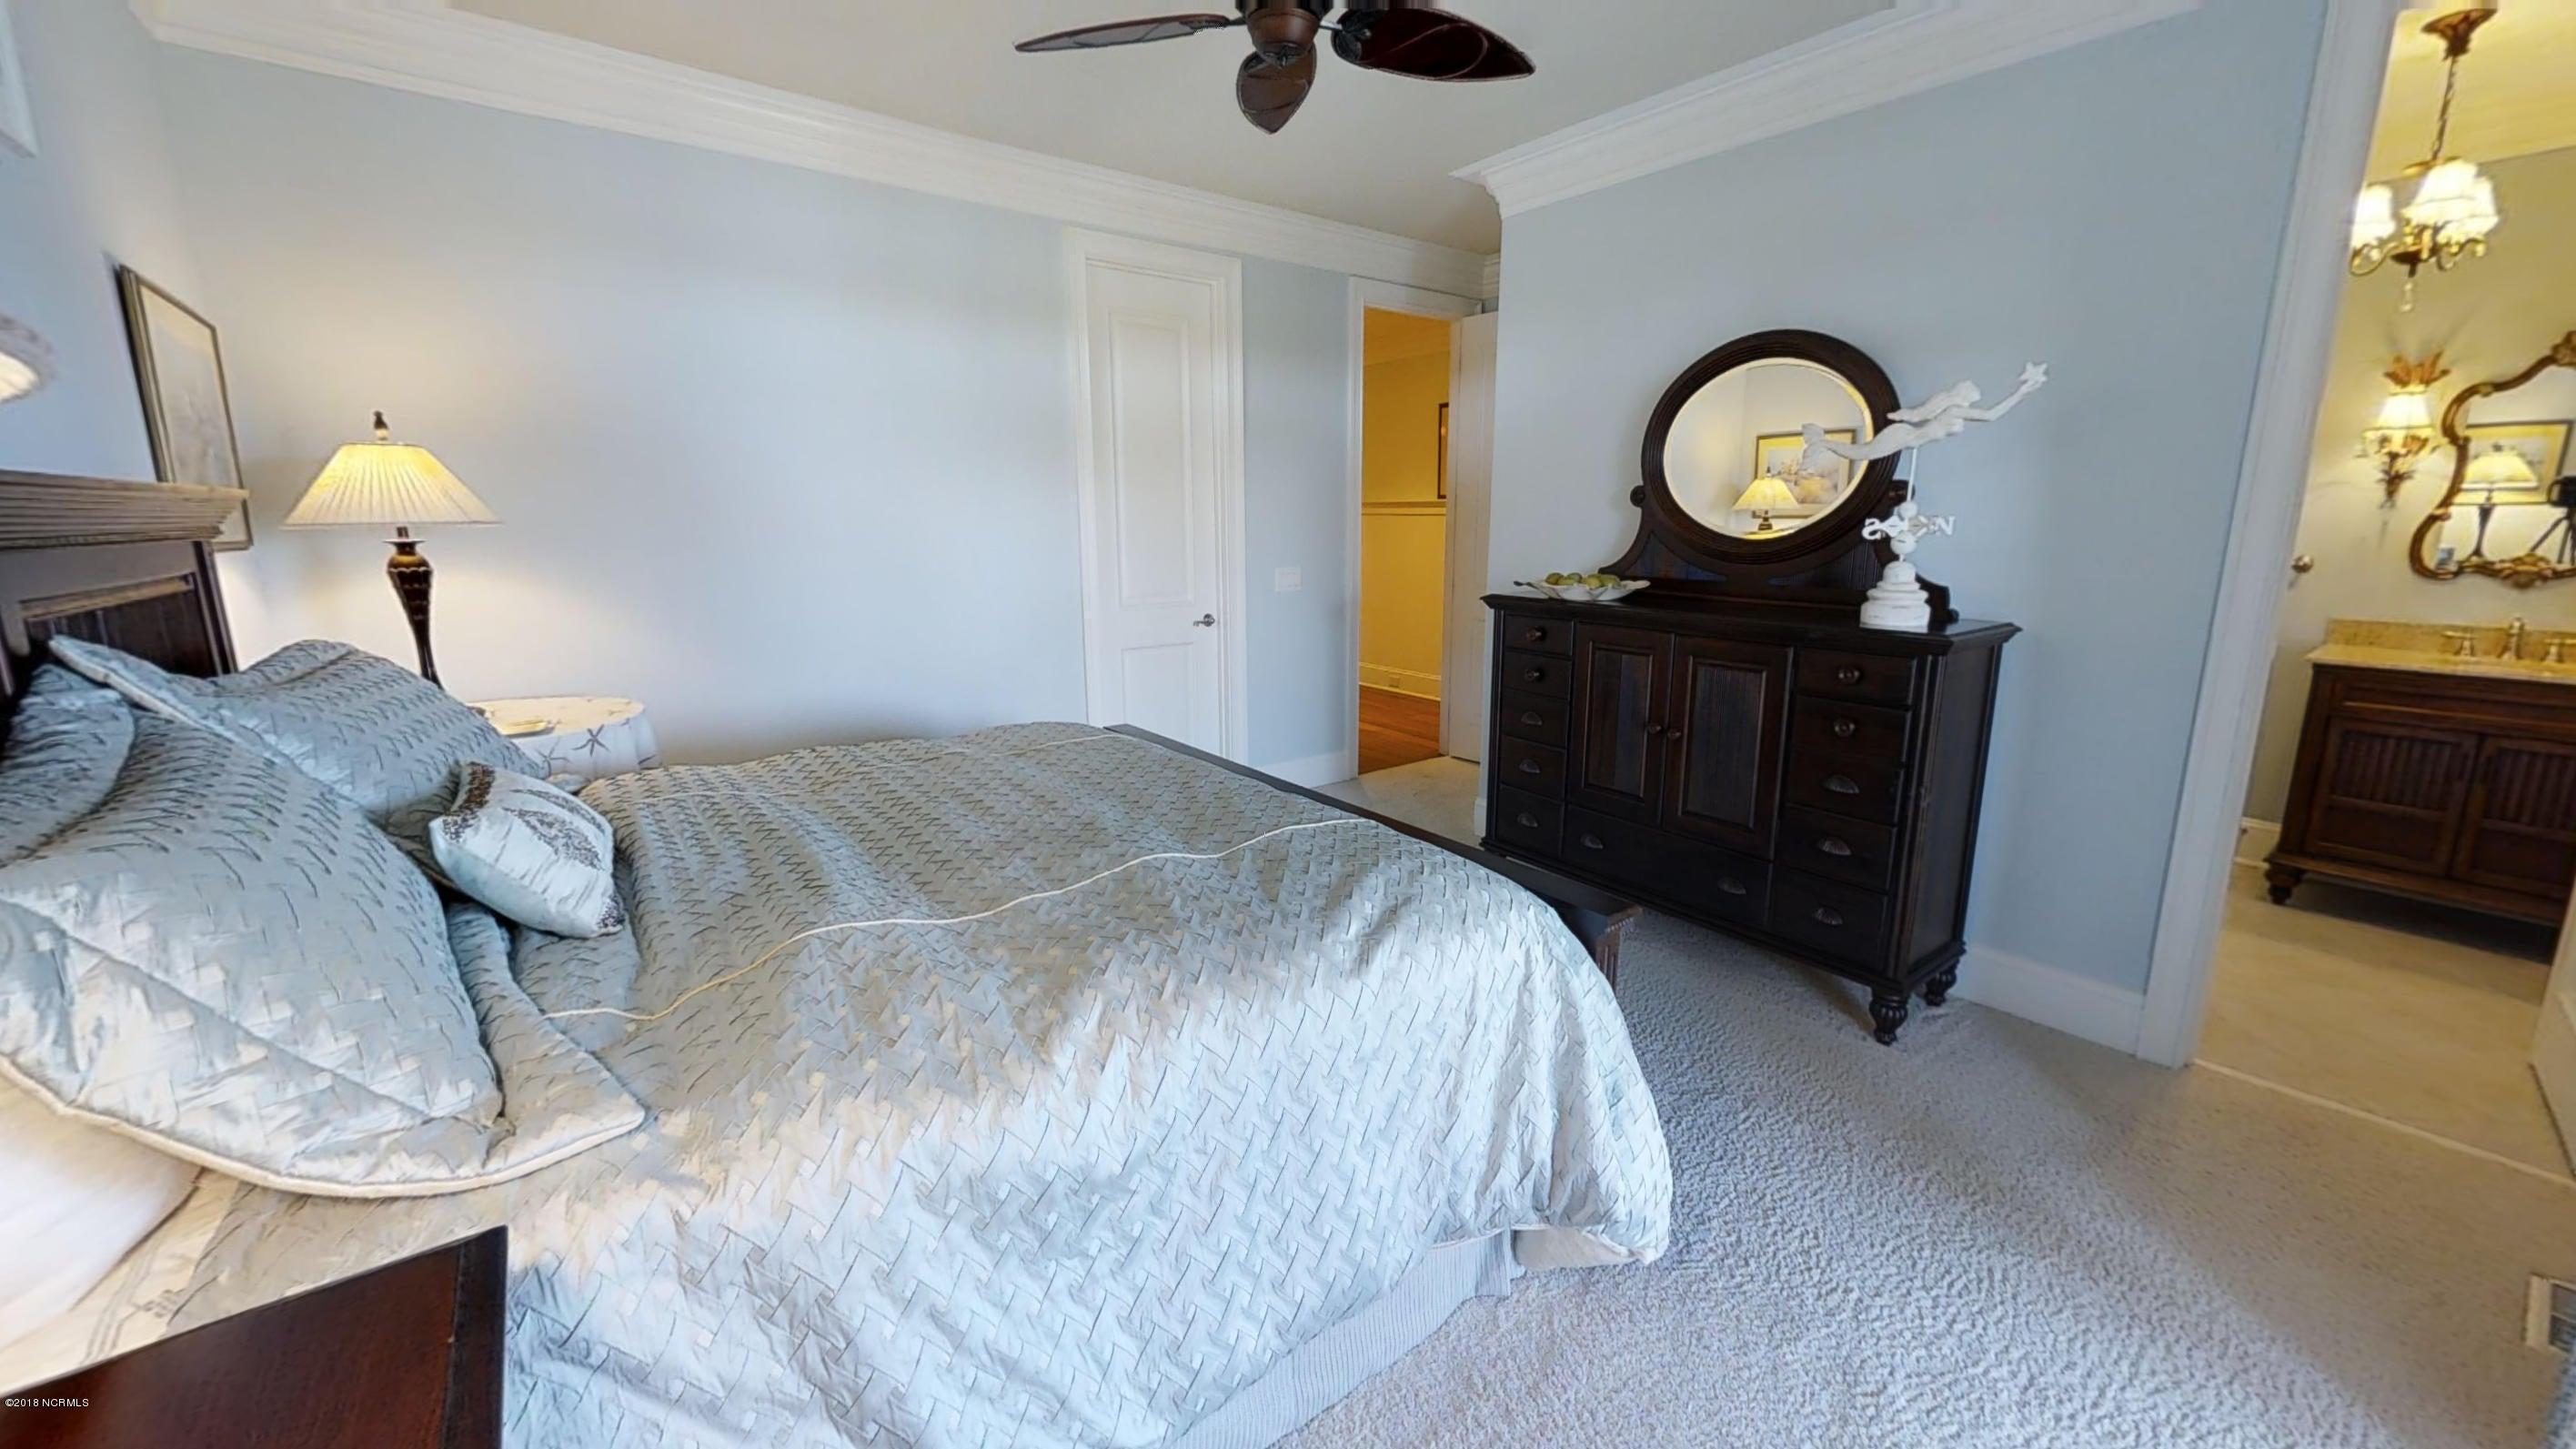 Ocean Isle Beach Real Estate - http://cdn.resize.sparkplatform.com/ncr/1024x768/true/20180414120355756482000000-o.jpg